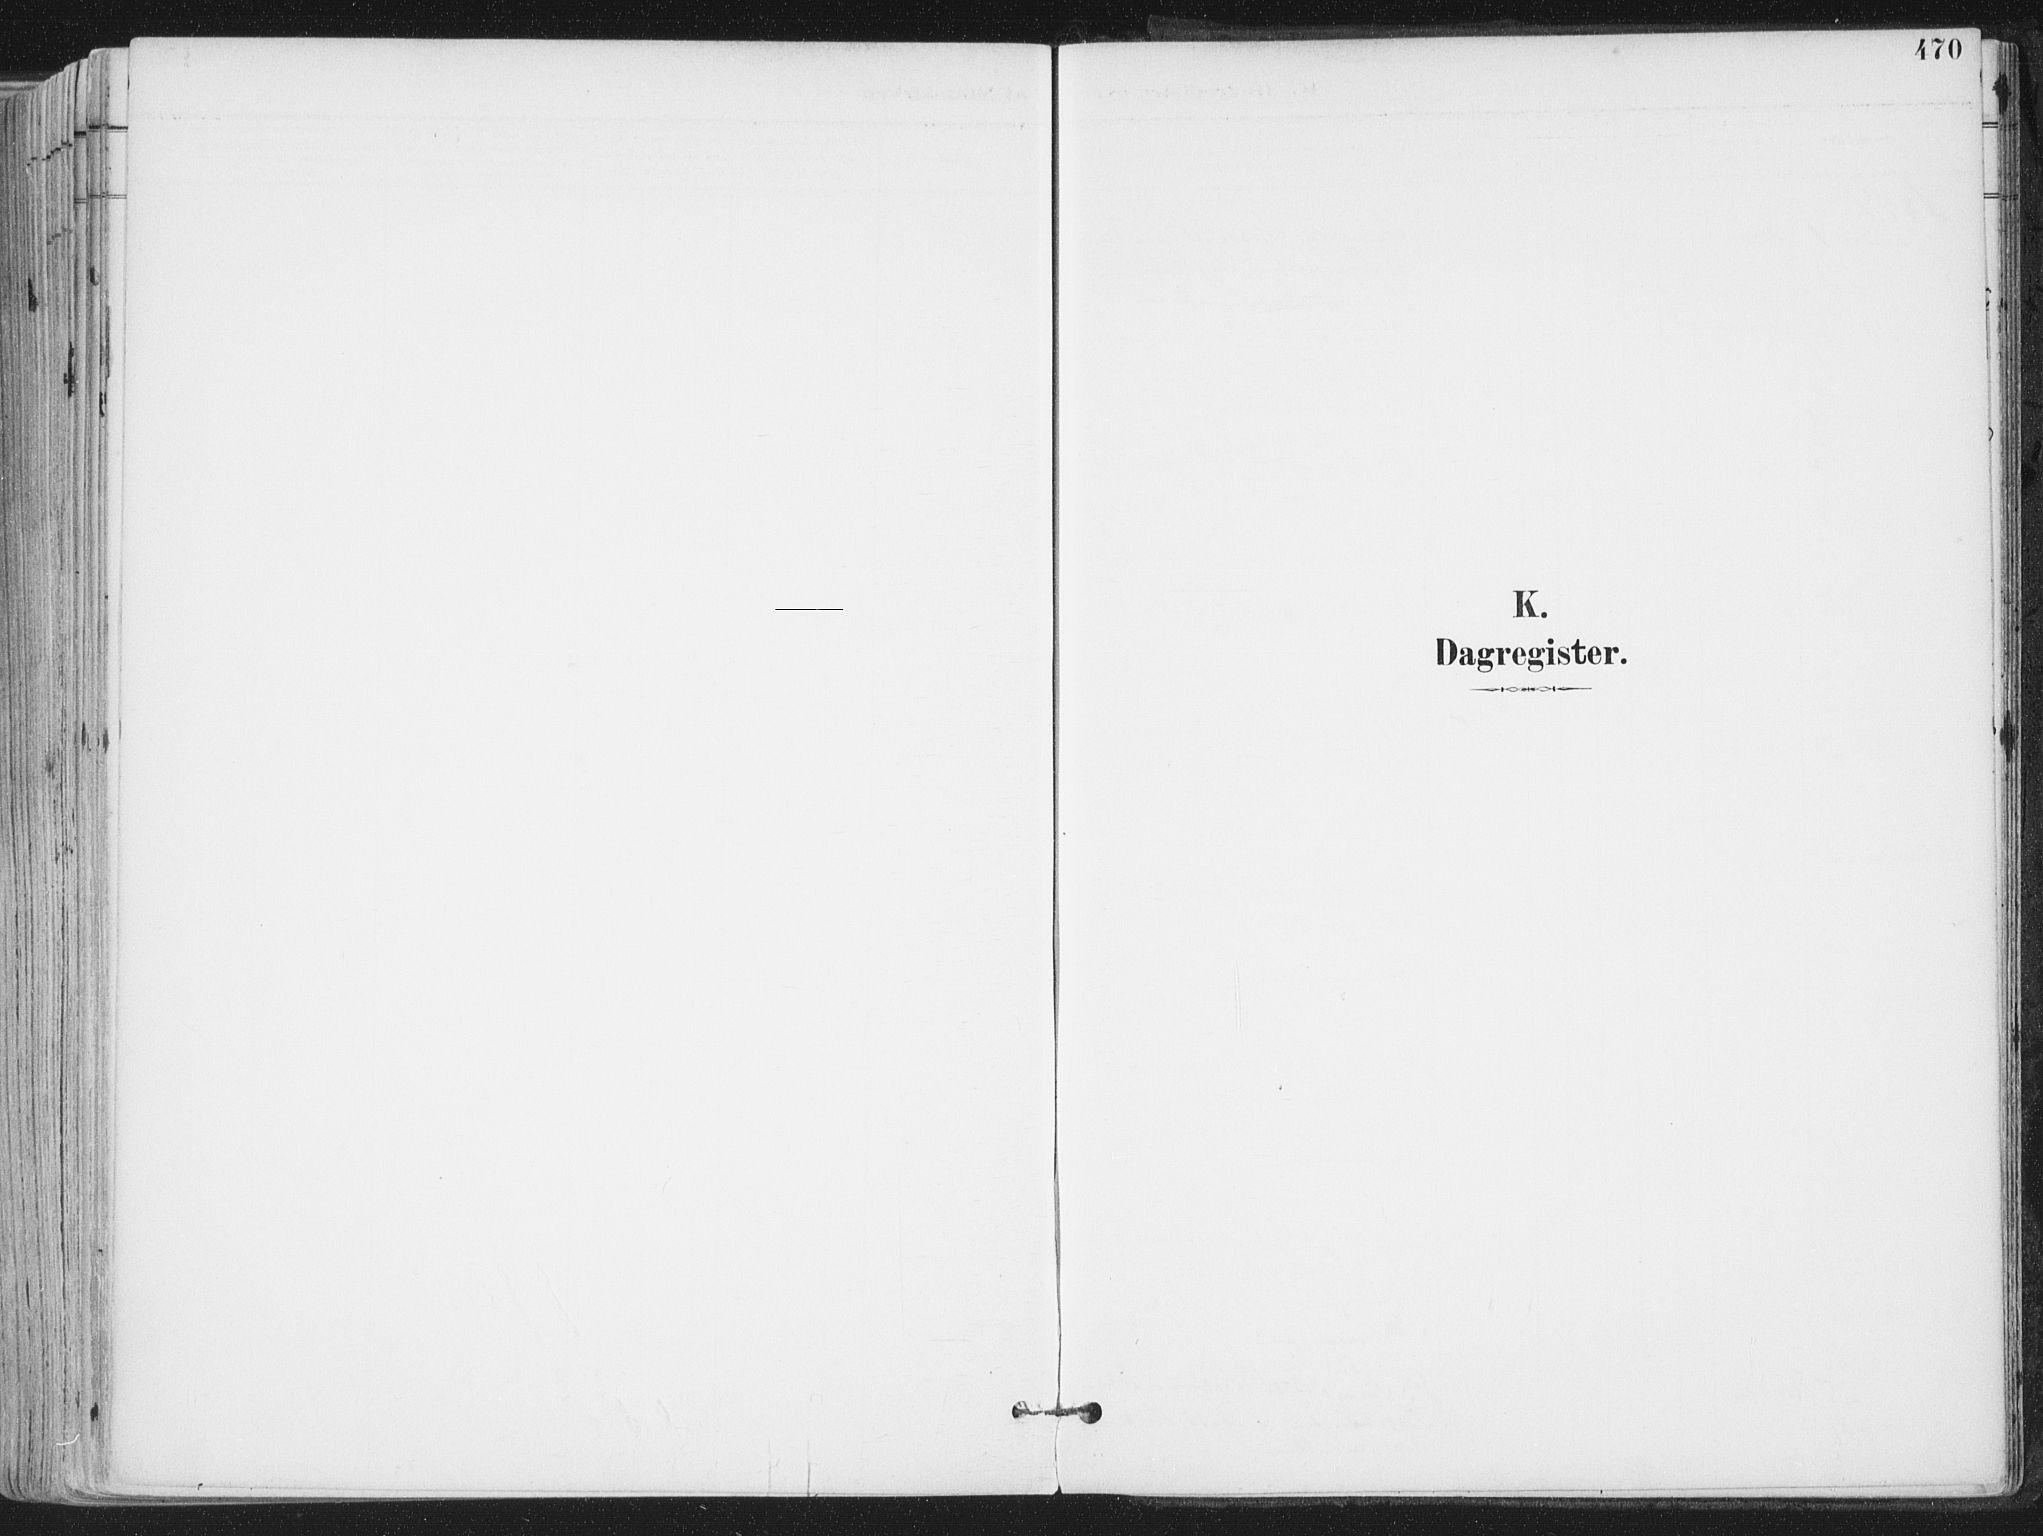 SAT, Ministerialprotokoller, klokkerbøker og fødselsregistre - Nordland, 802/L0055: Ministerialbok nr. 802A02, 1894-1915, s. 470